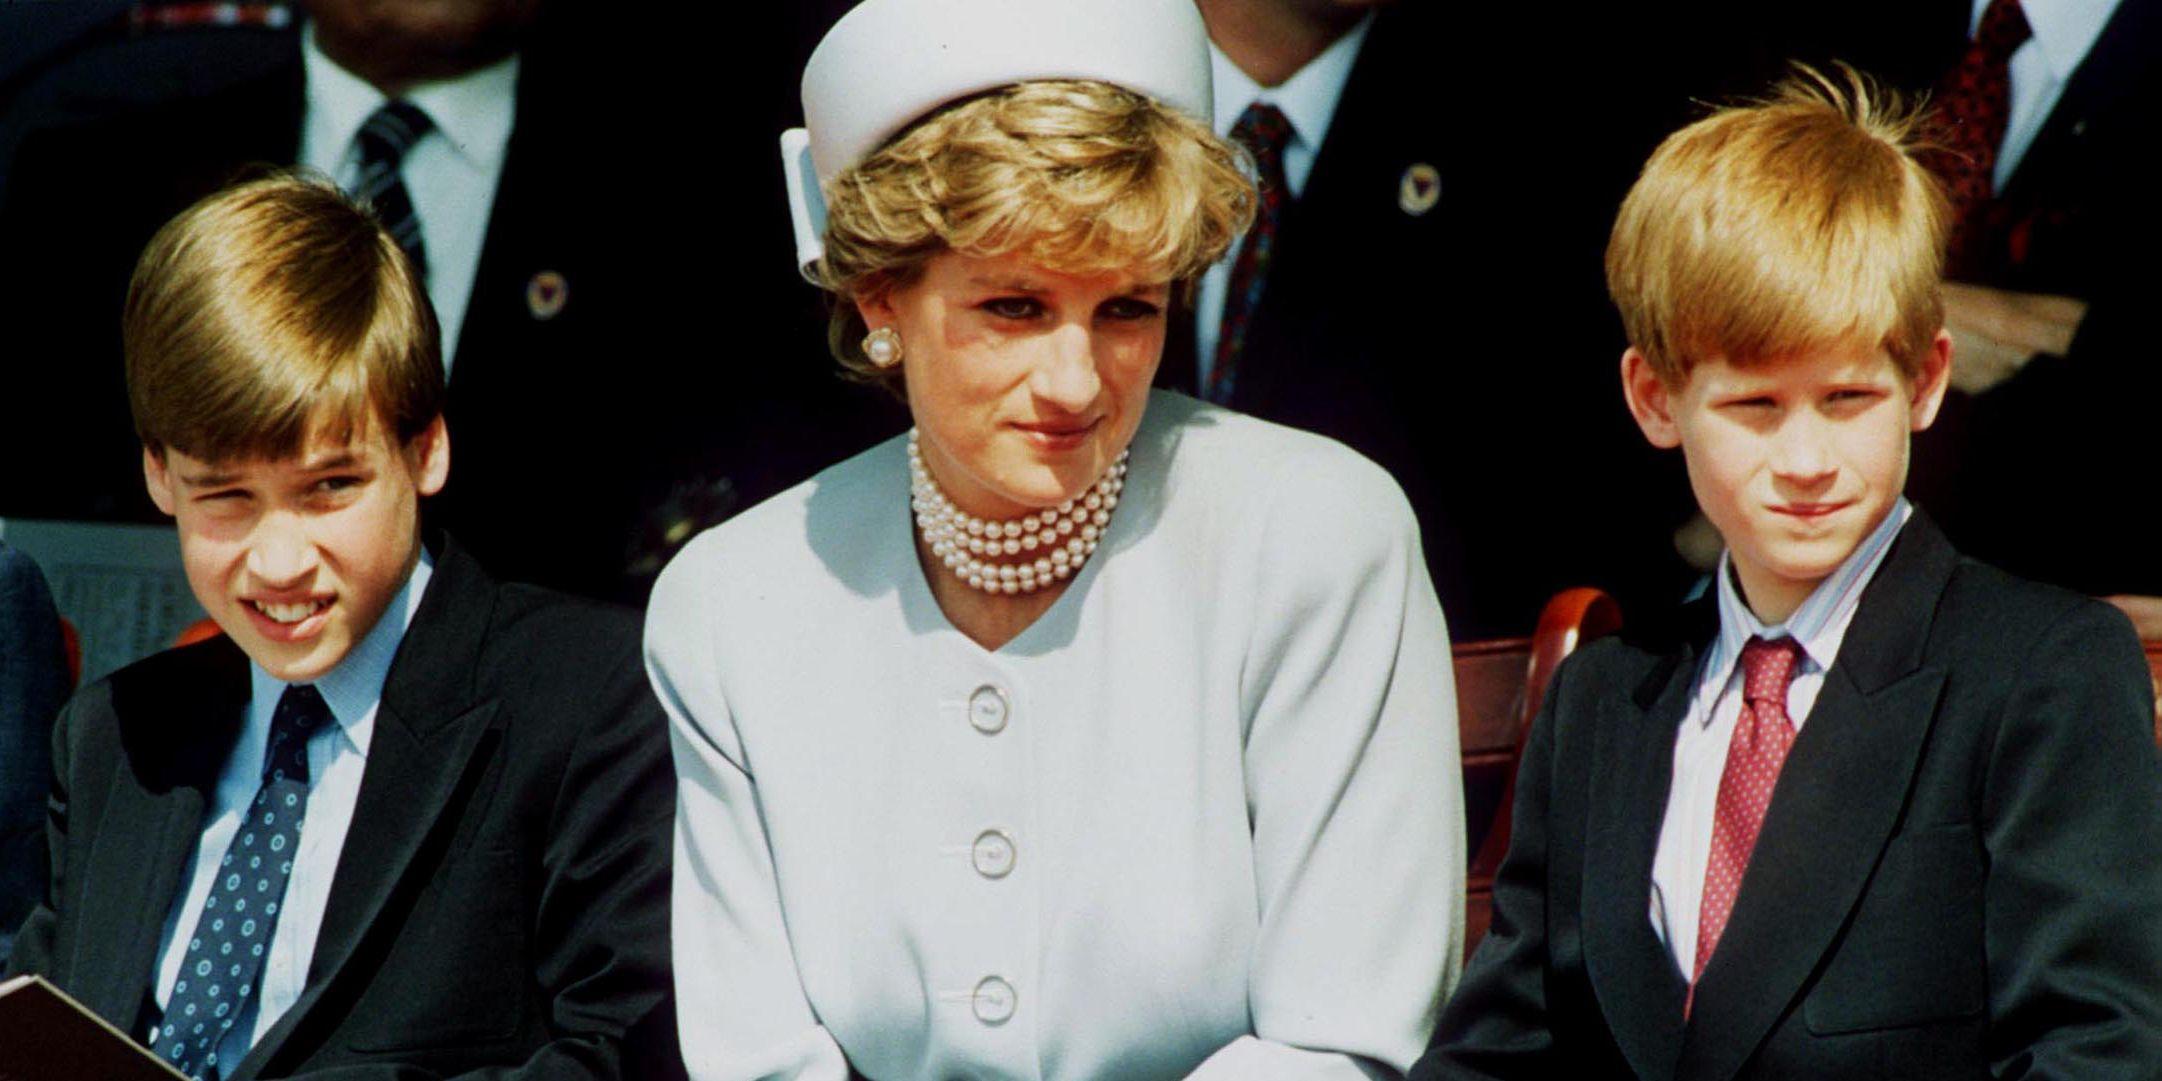 photo Princess Dianas Belongings Are Going on Display at Buckingham Palace